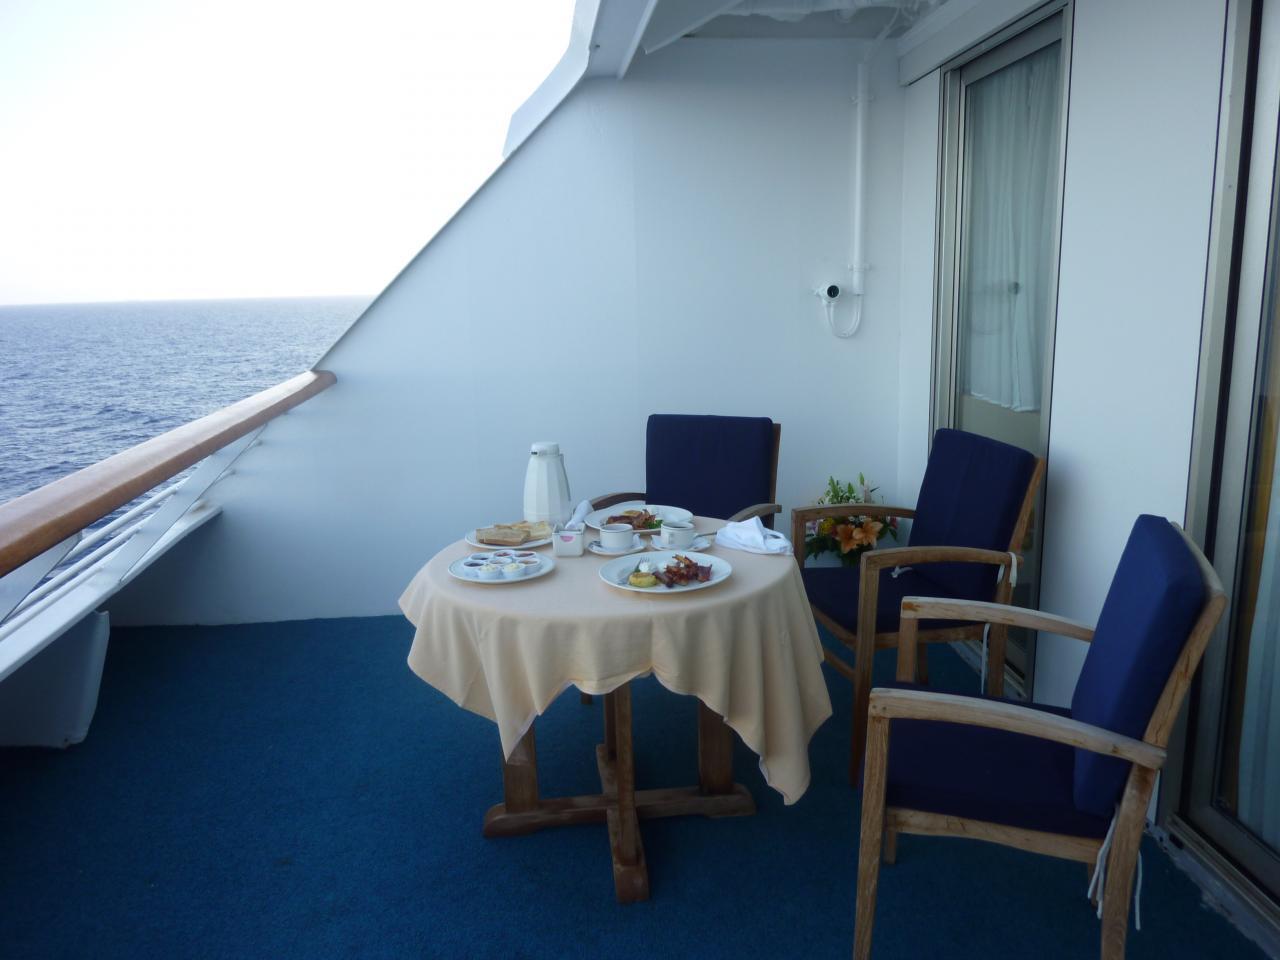 Princess Sea Princess Cruise Review for Cabin B755